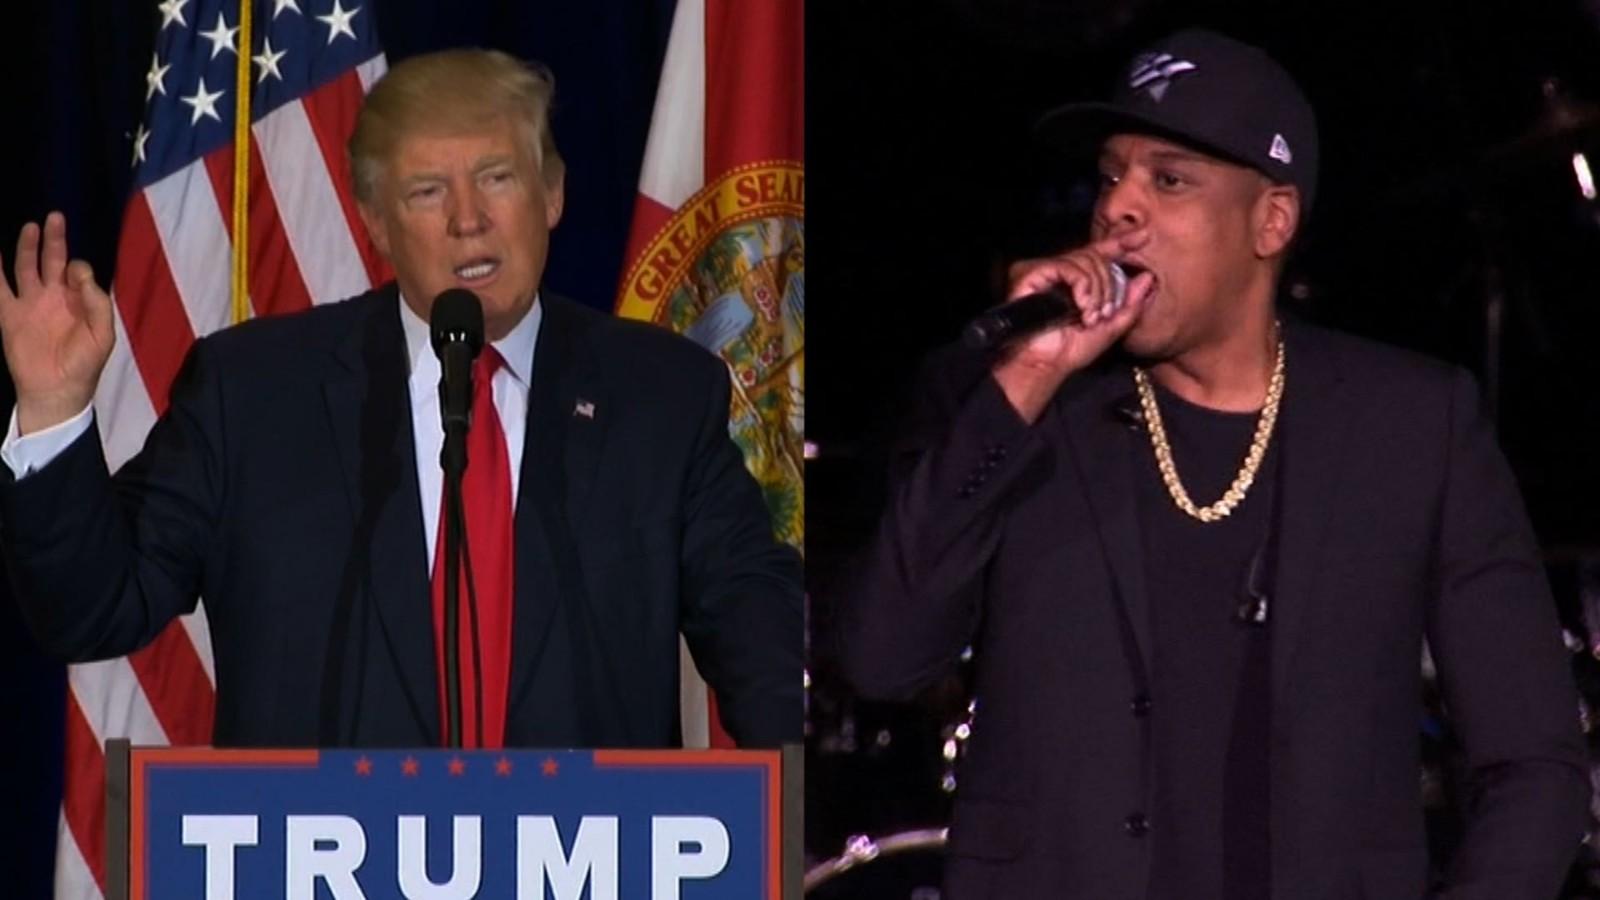 Trump hits Clinton over Jay Z's profanity at concert